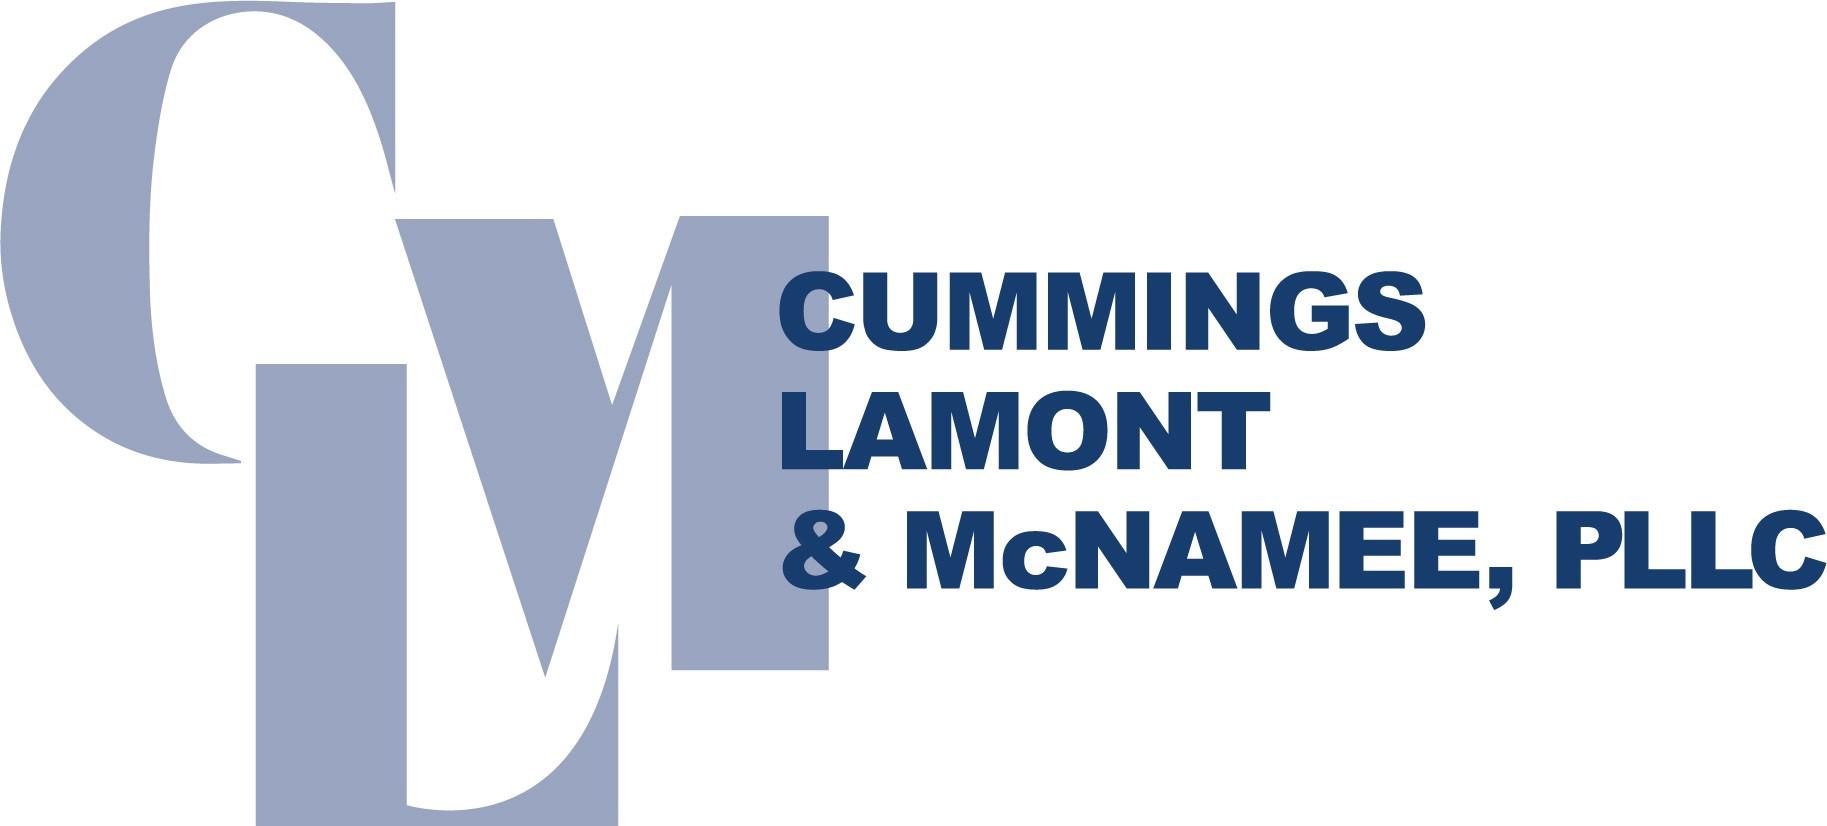 Cummings, Lamont, & McNamee